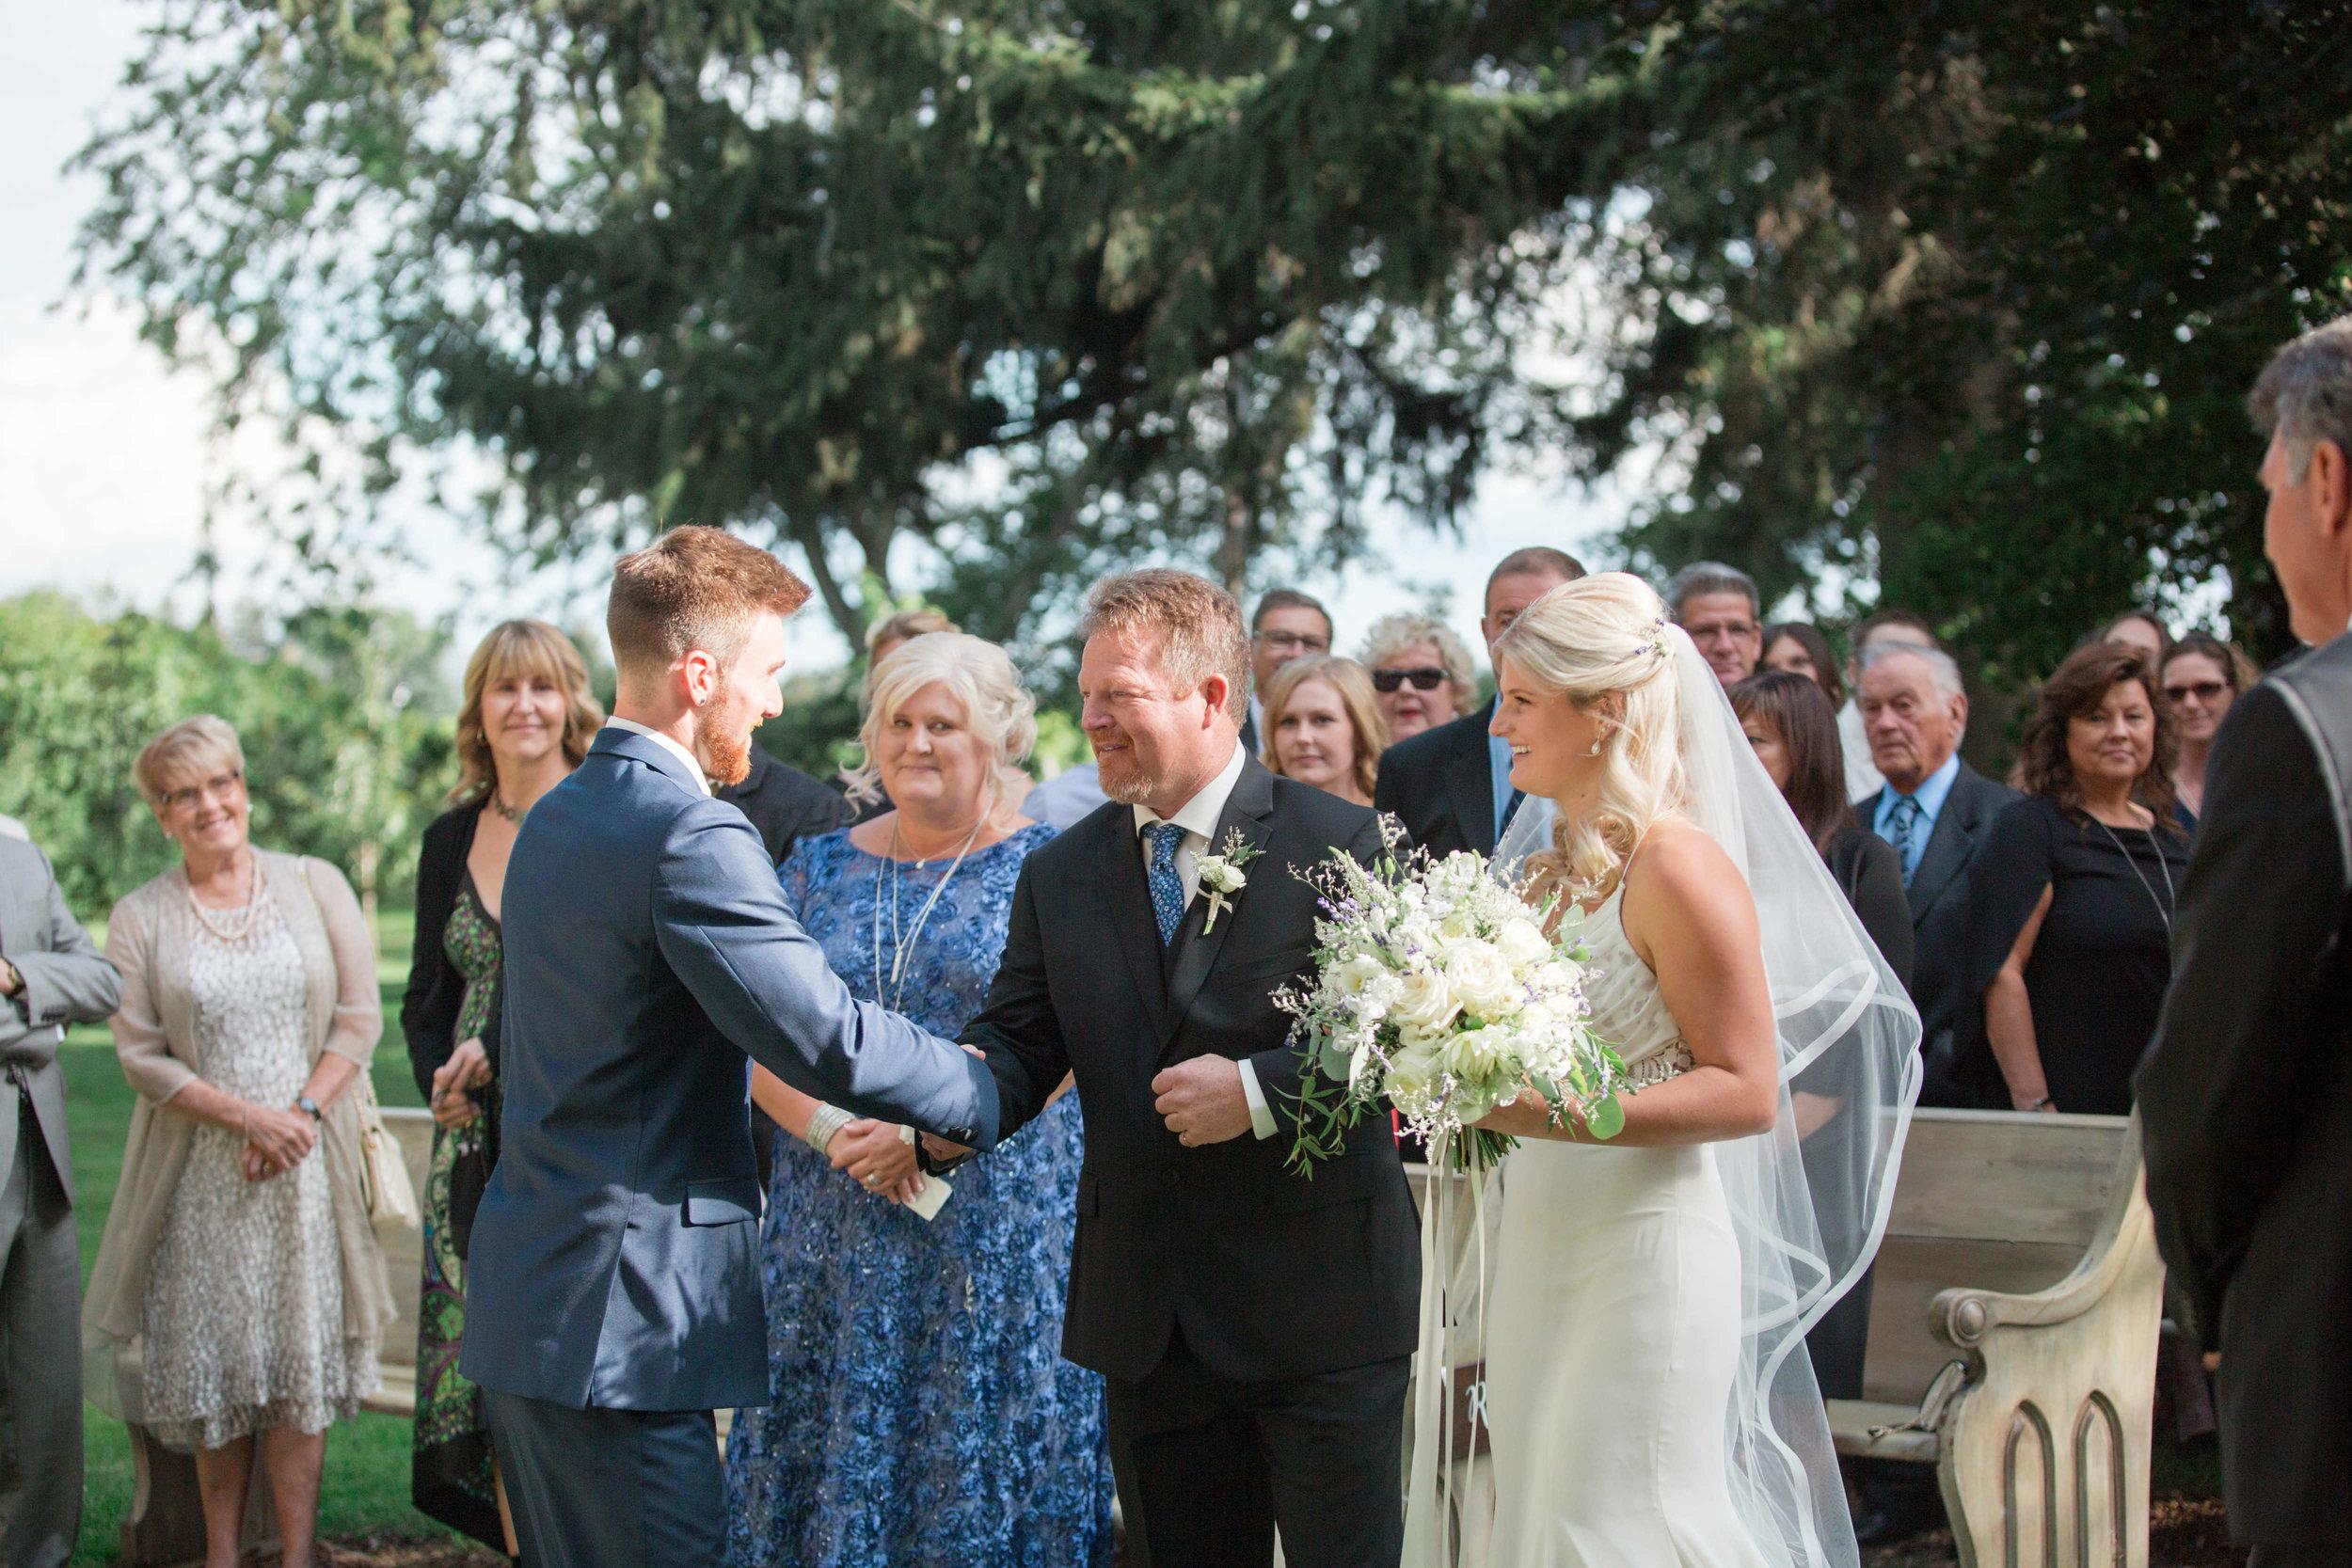 Maddy___Brandon___Daniel_Ricci_Weddings_High_Res._Finals_266.jpg